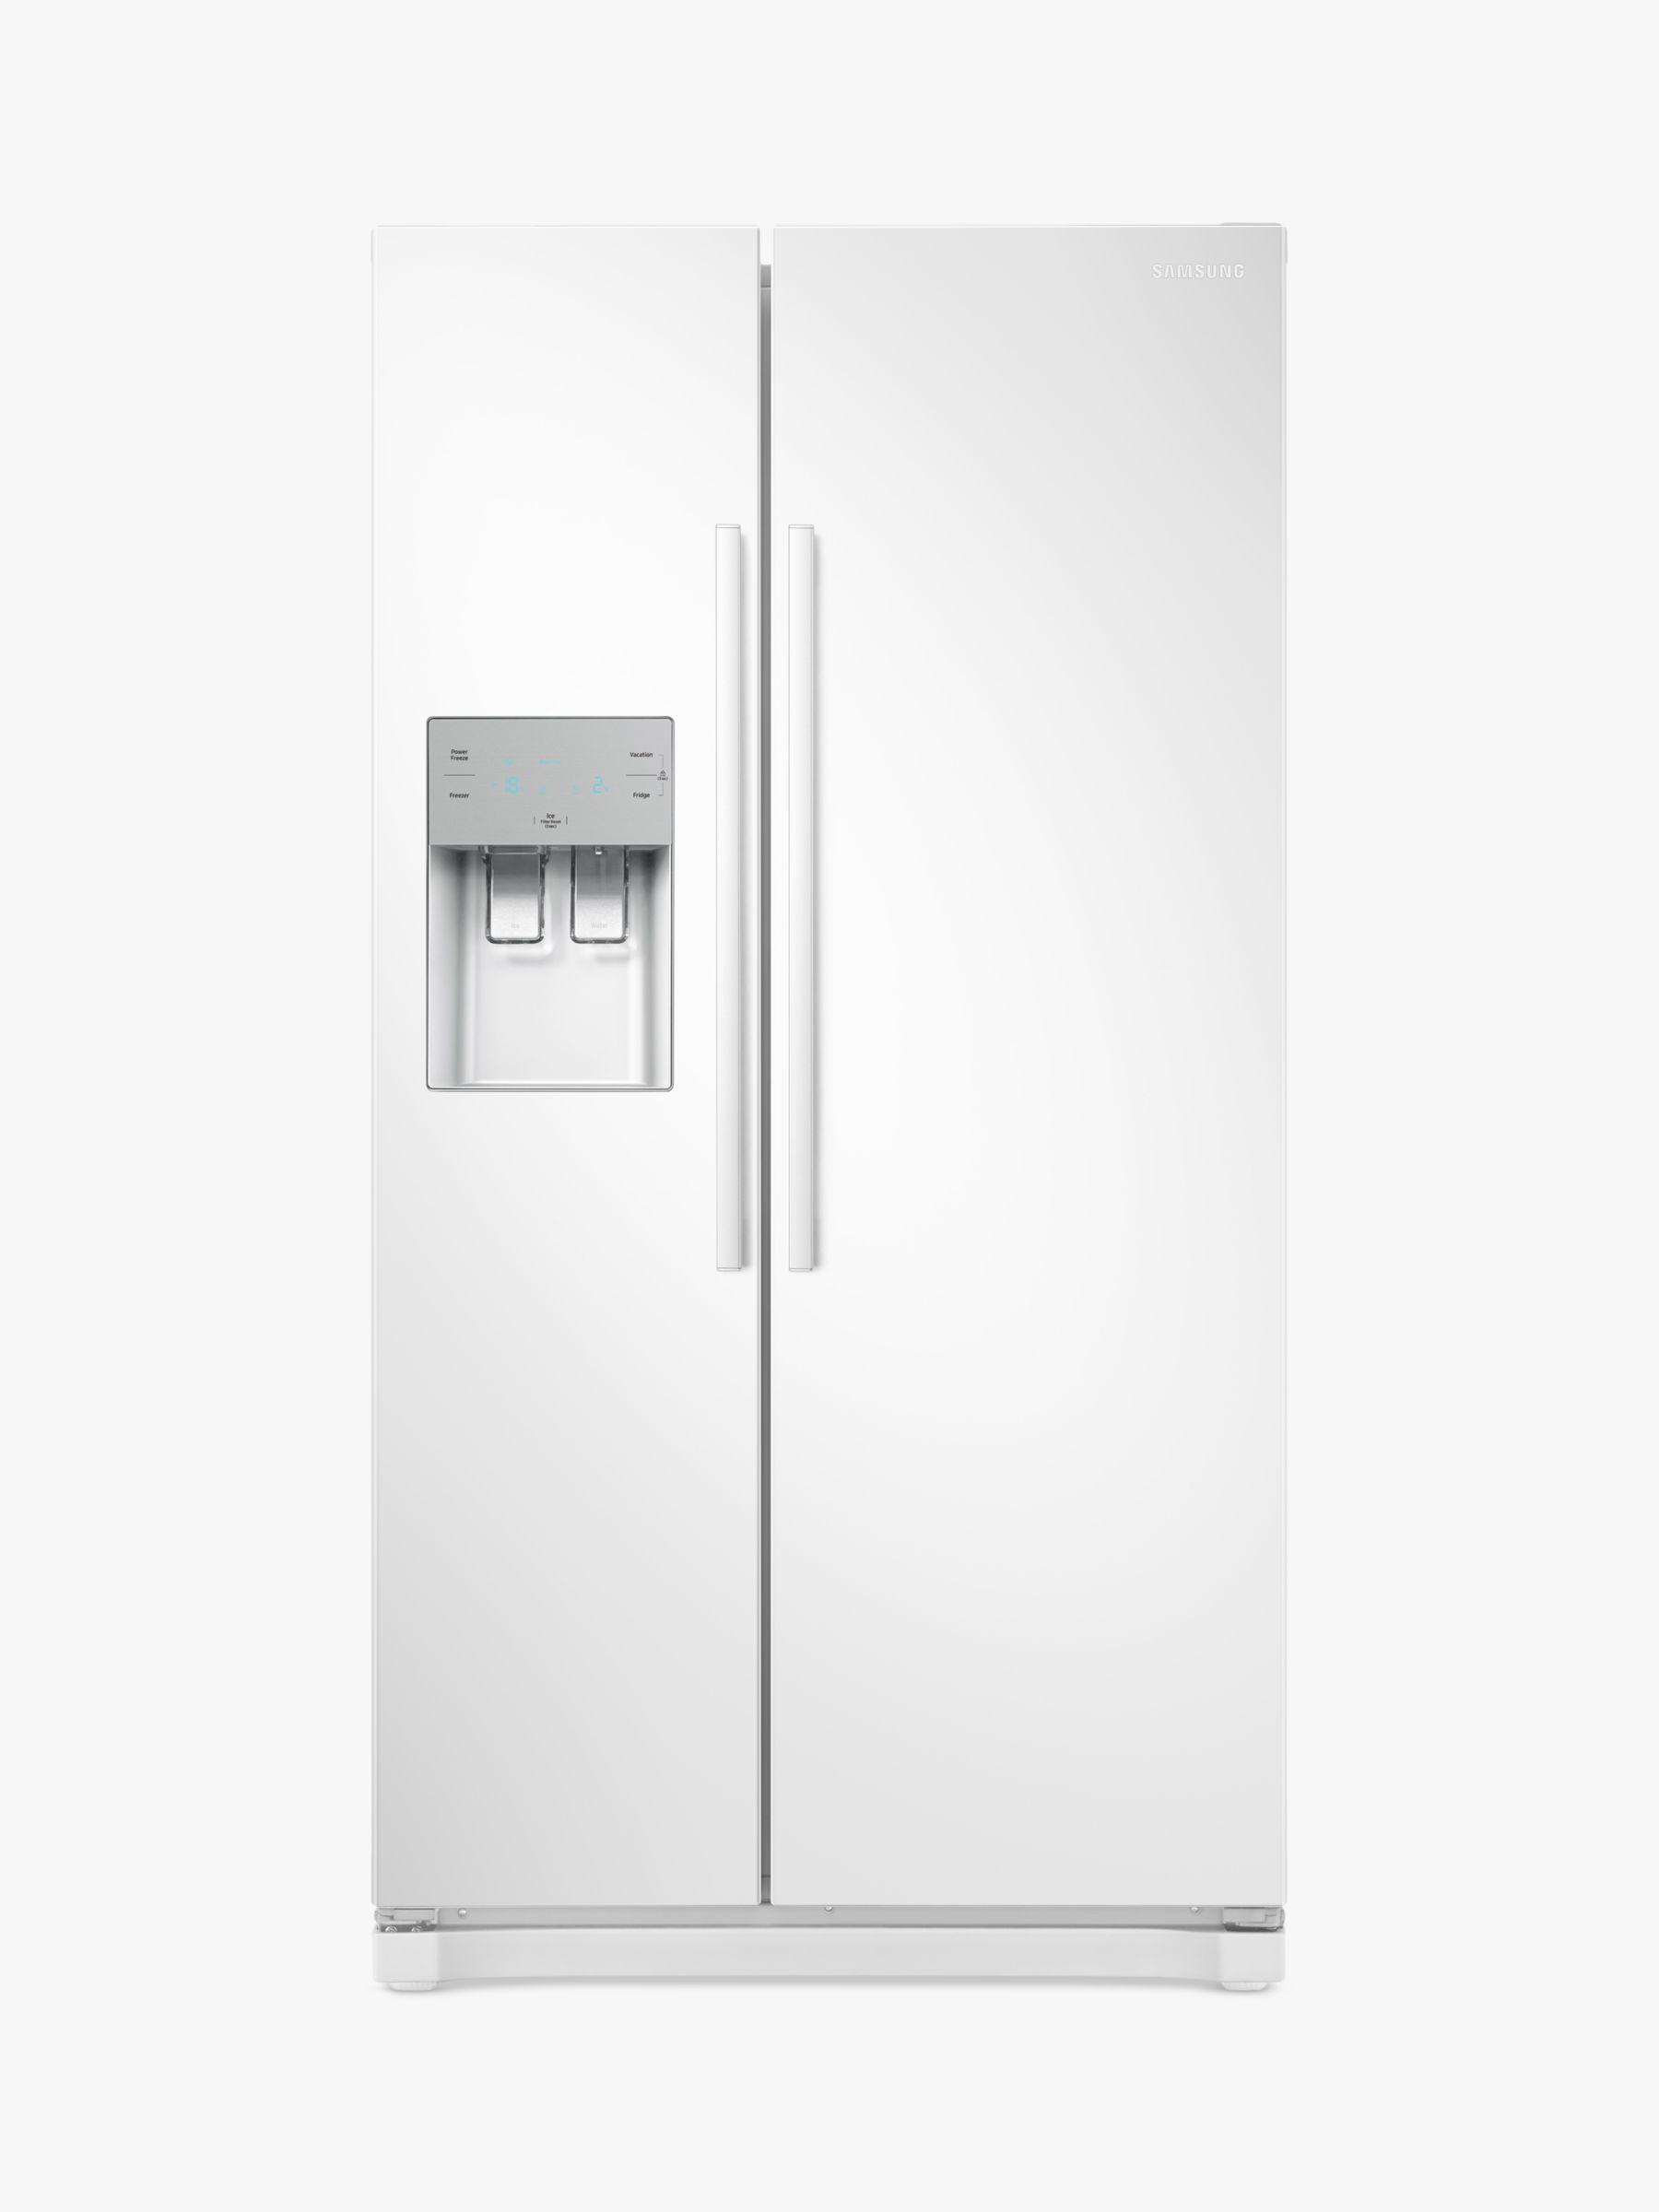 Samsung Samsung RS50N3513WW Freestanding American Style Fridge Freezer, A+ Energy Rating, 91cm Wide, White